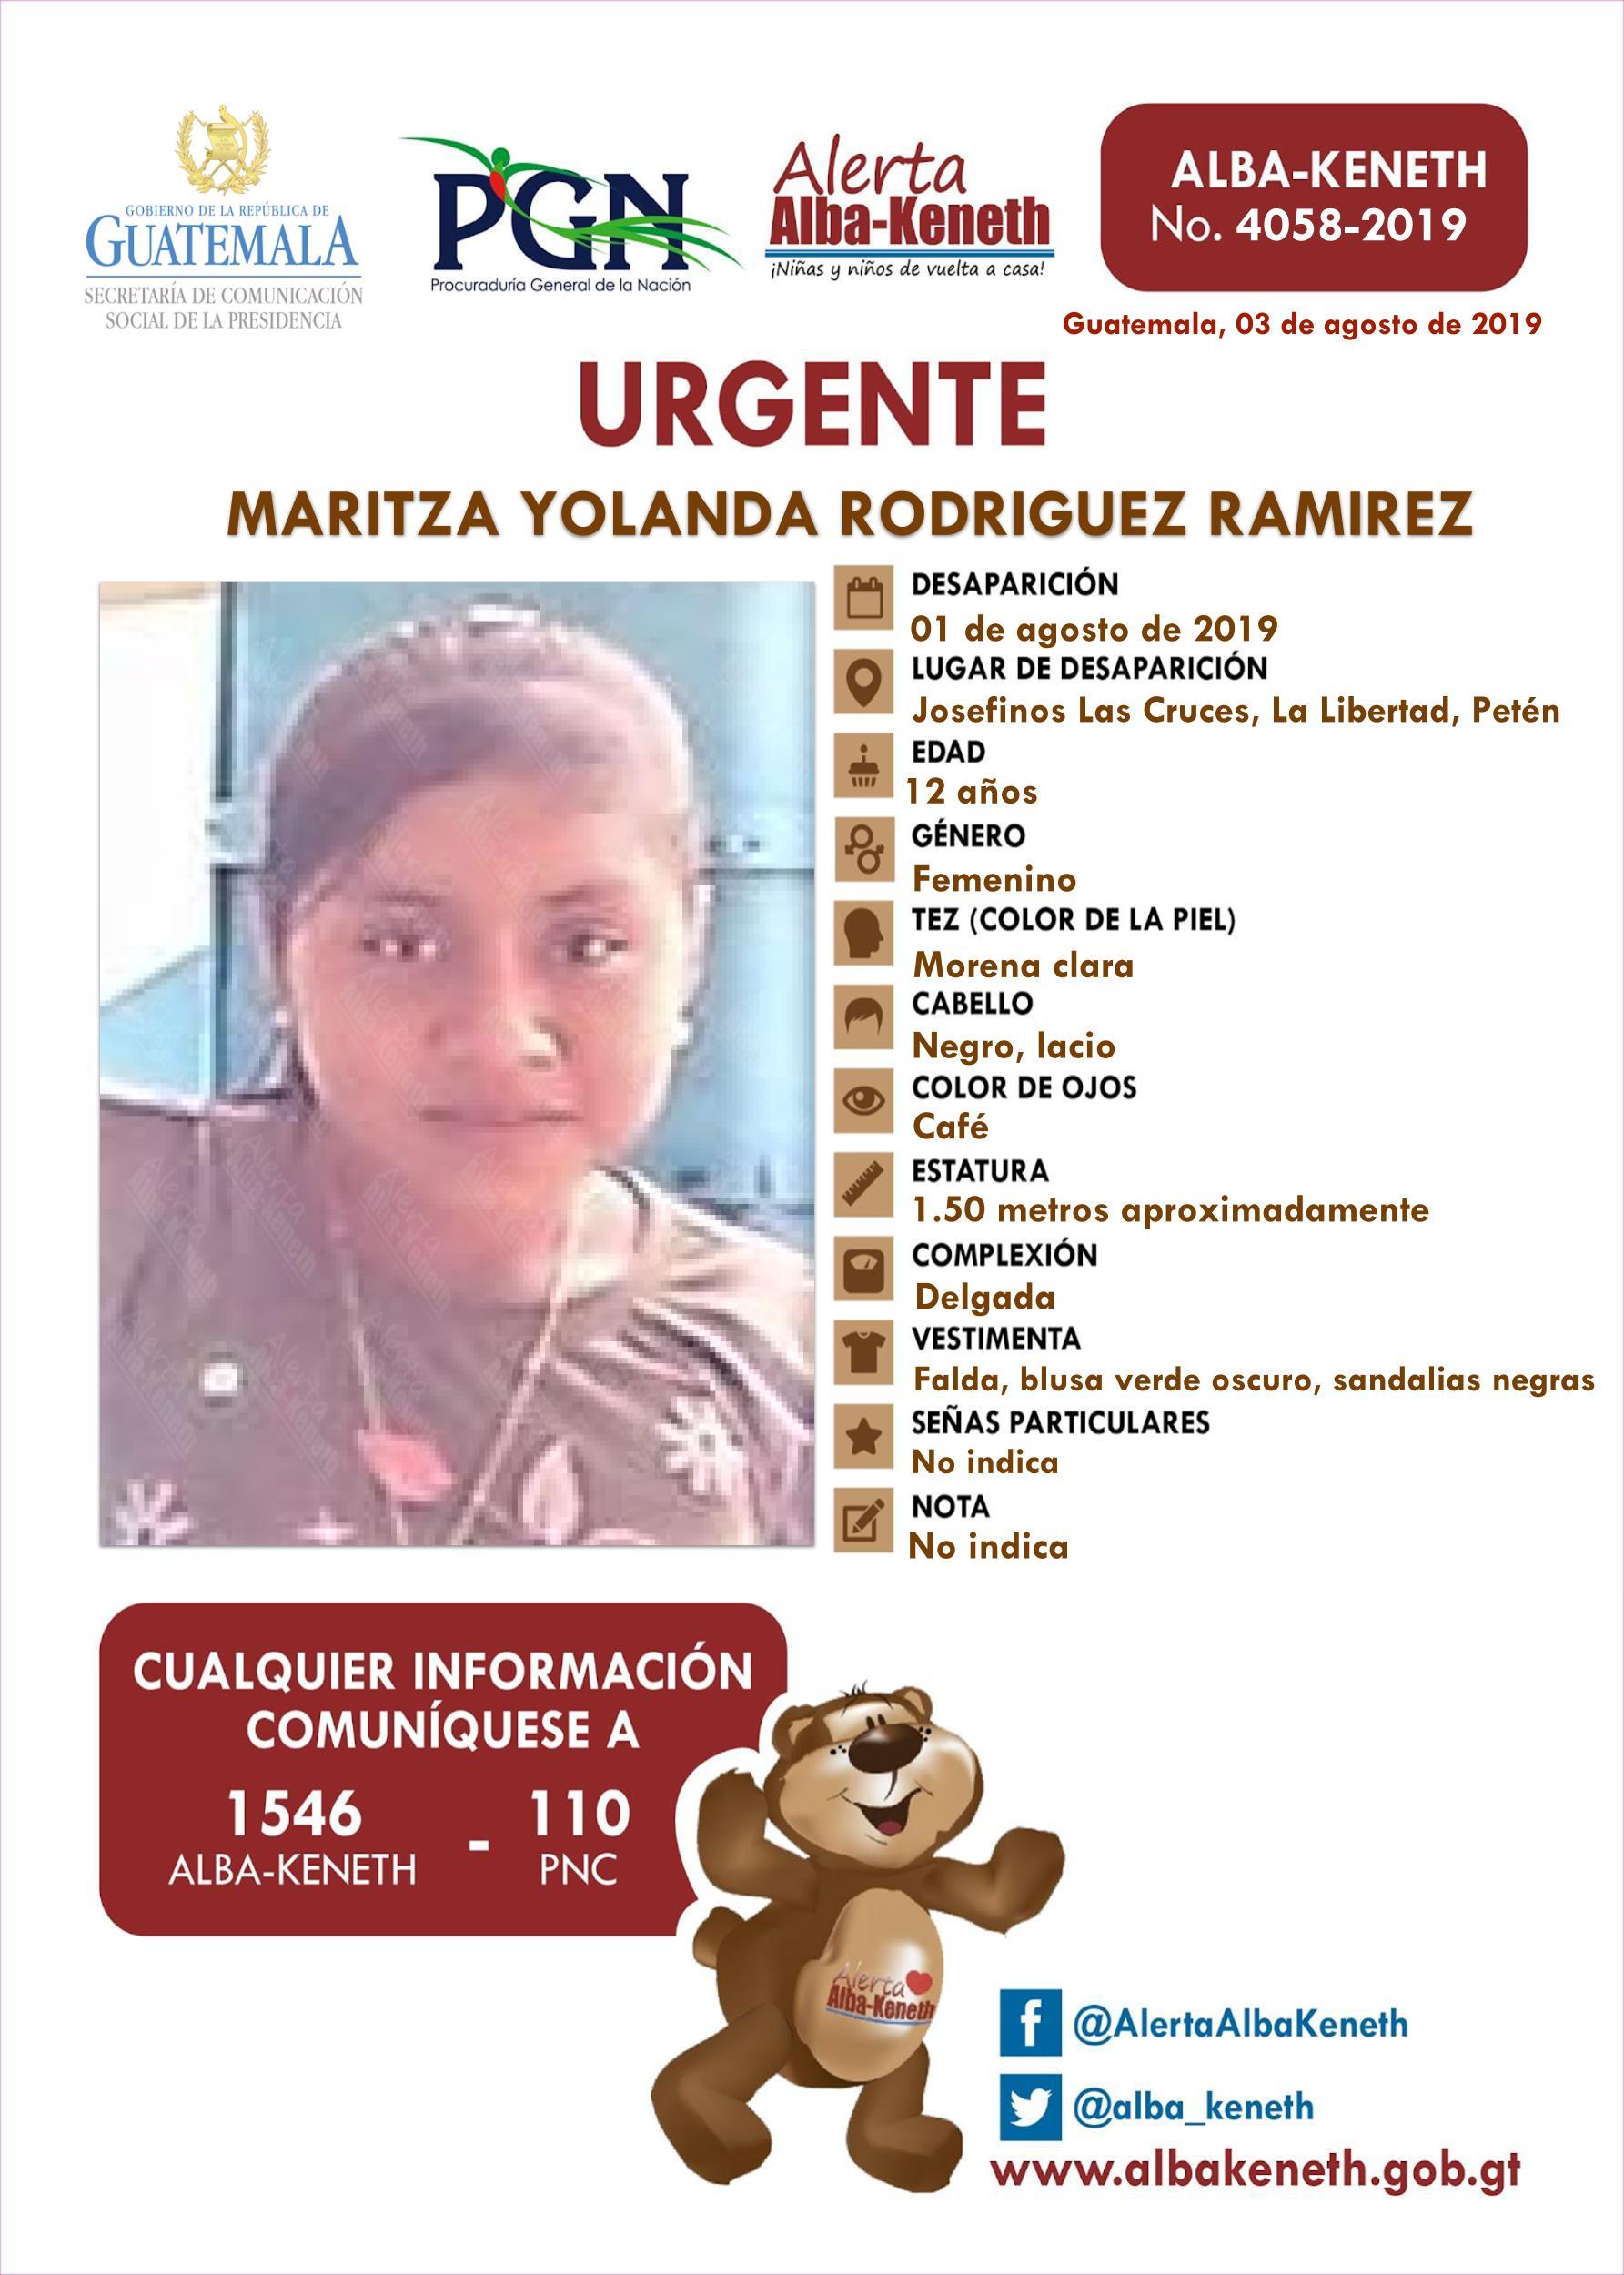 Maritza Yolanda Rodriguez Ramirez